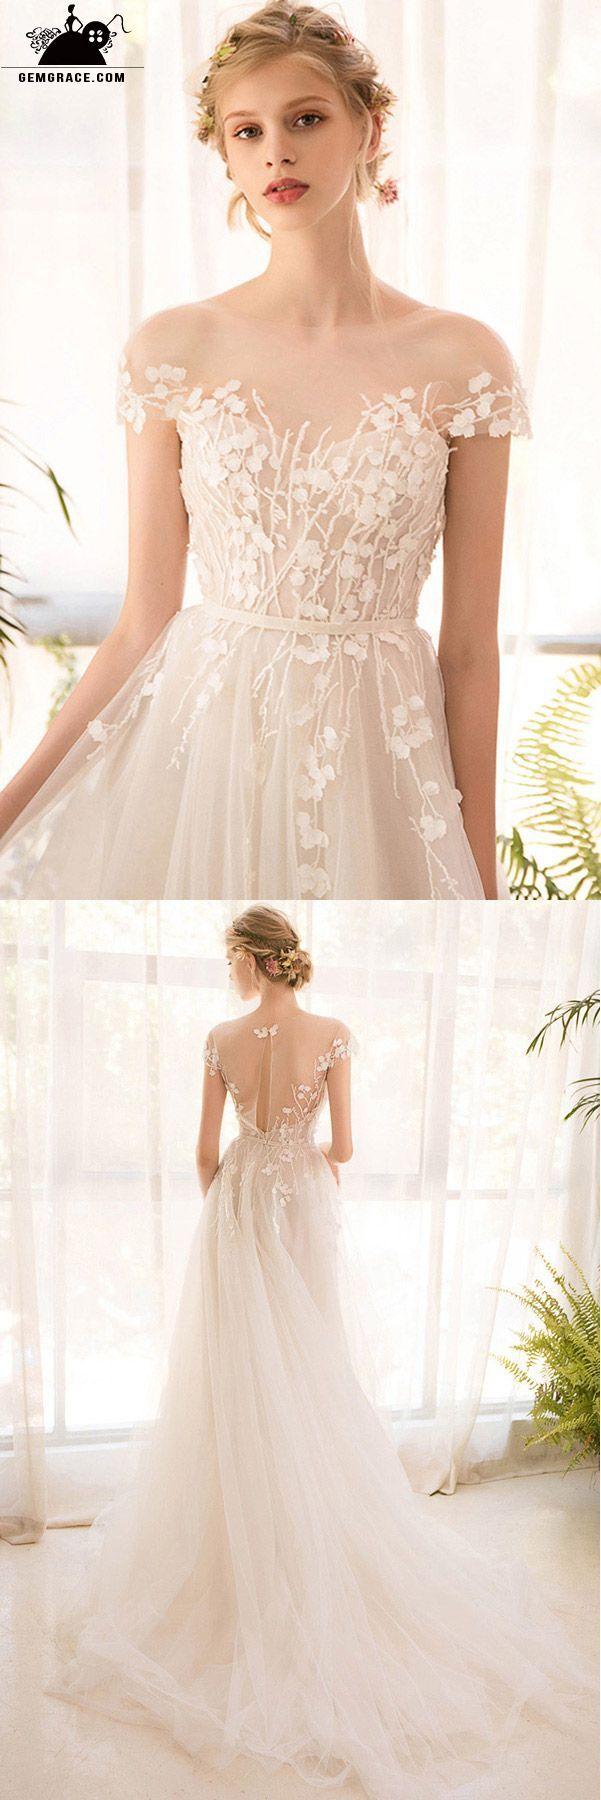 Romantic leaf lace sheer neckline boho wedding dress body